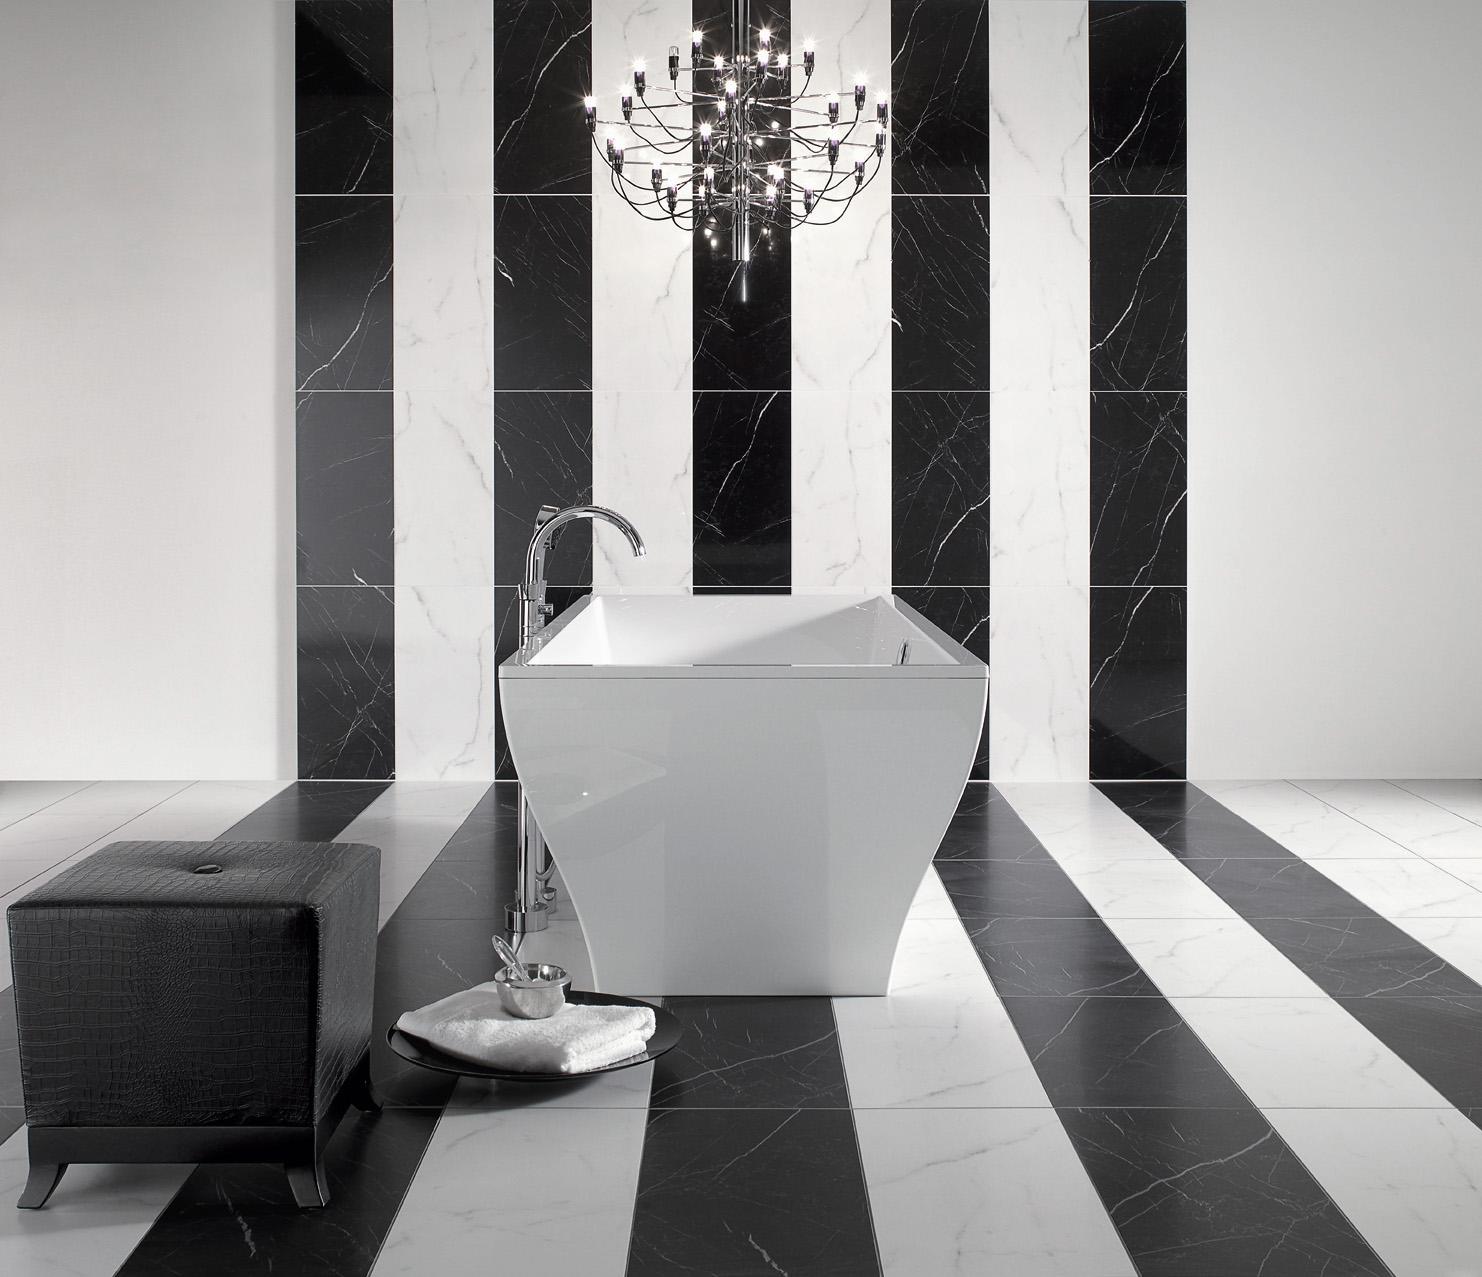 Luxus Villeroy Boch Fliesen | Haus Design-Ideen